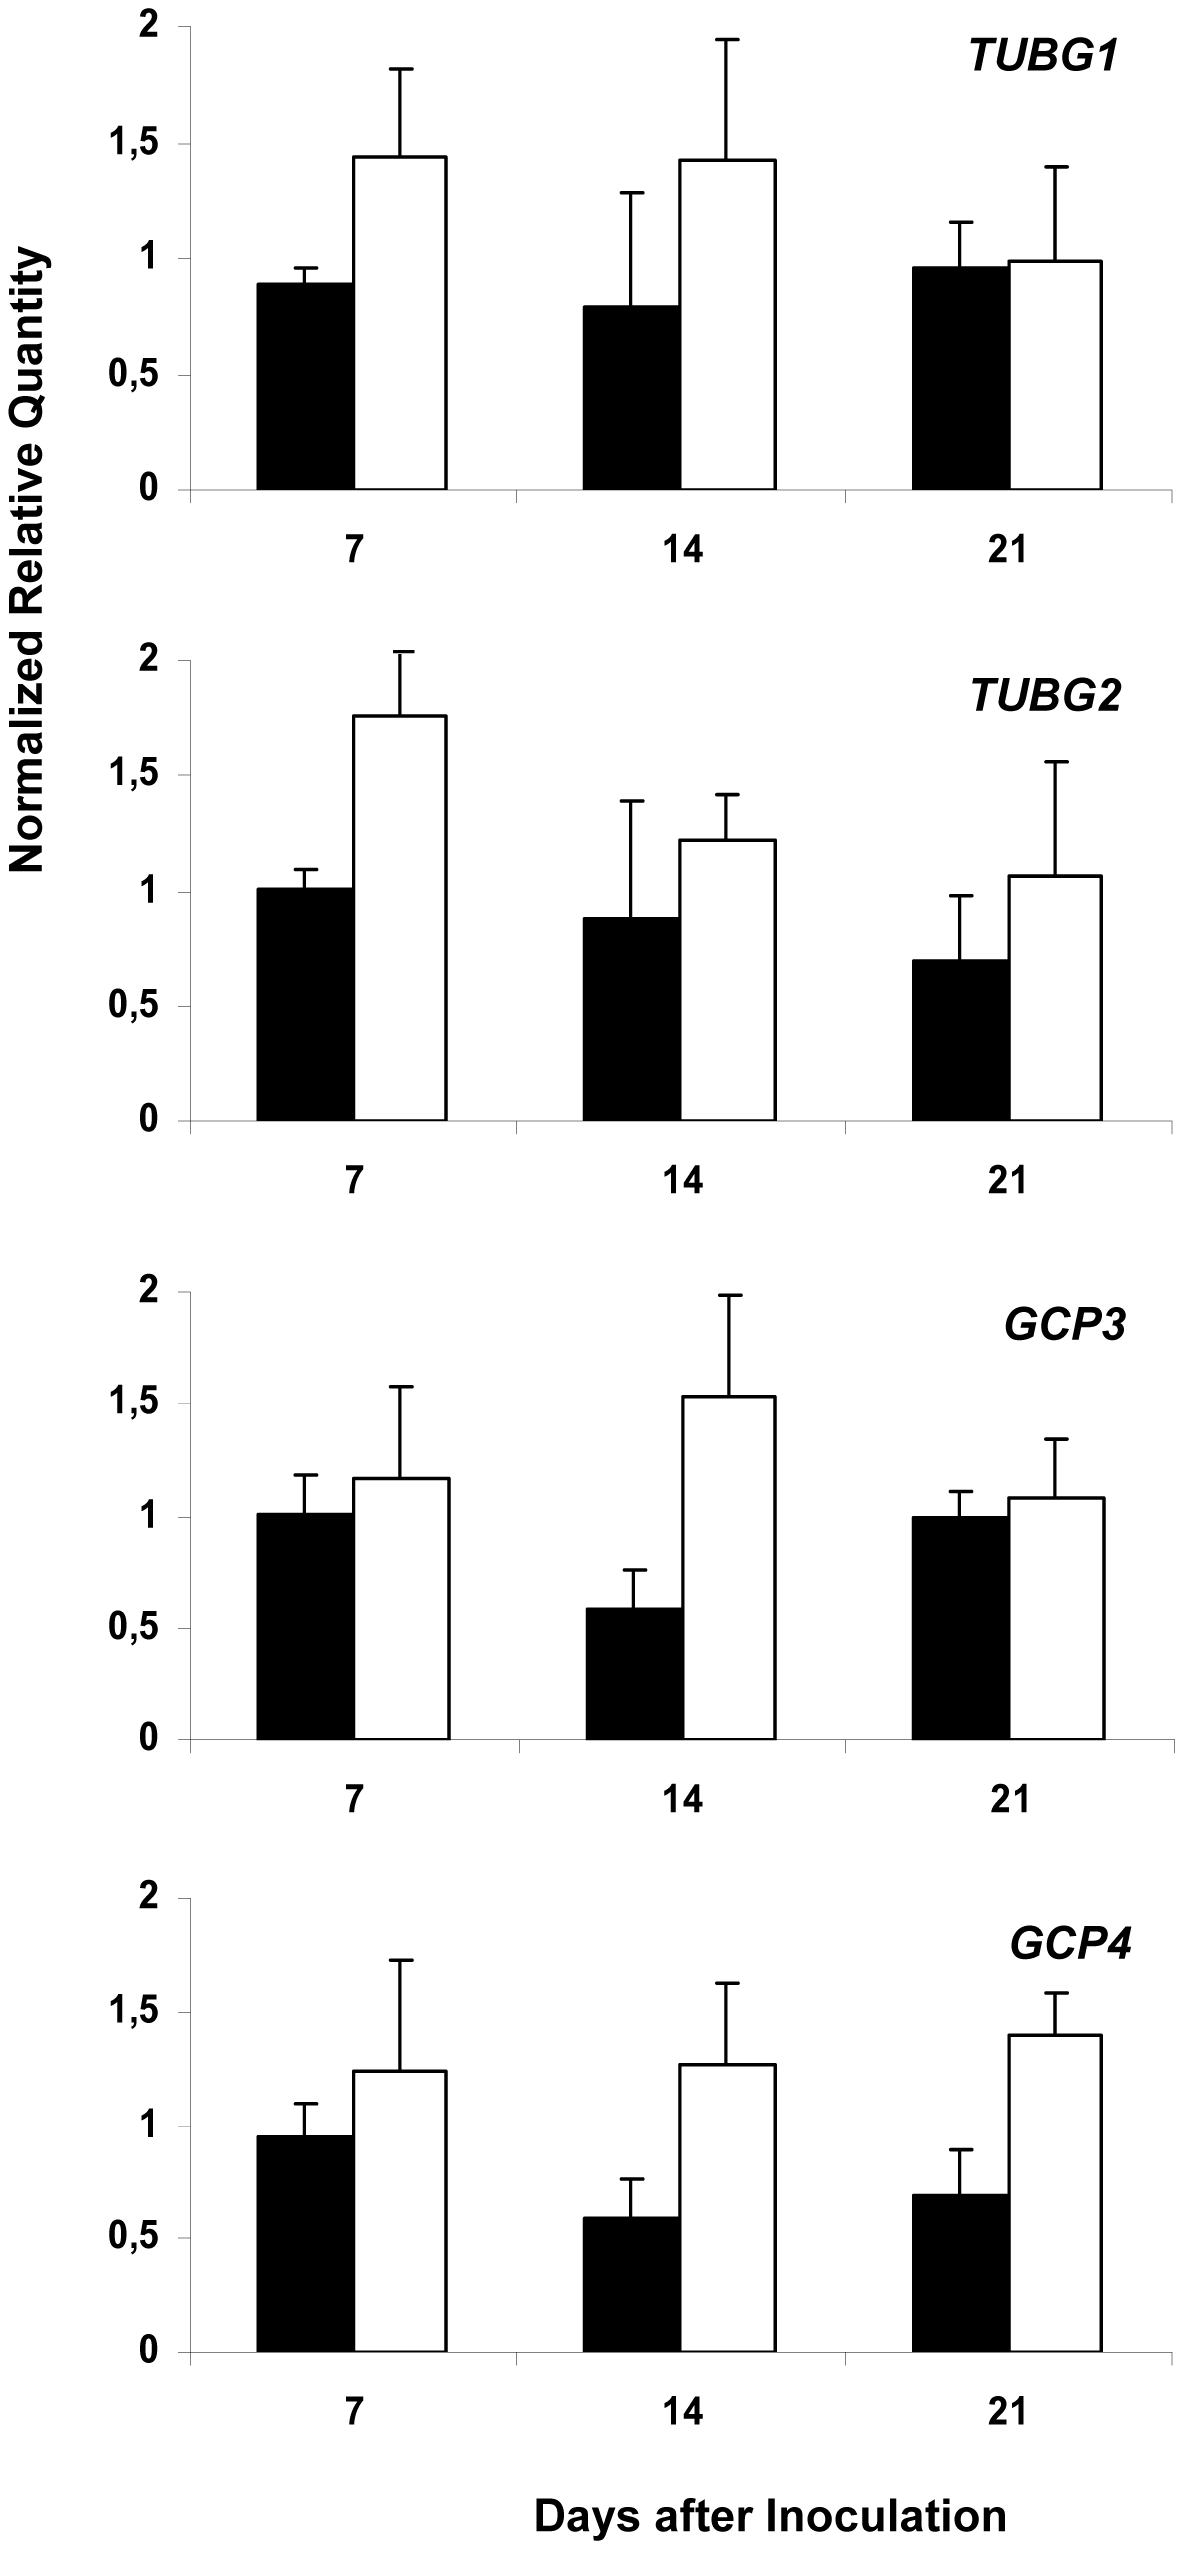 Analysis of Expression Levels of <i>TUBG1</i>, <i>TUBG2</i>, <i>GCP3</i> and <i>GCP4</i> in Galls.